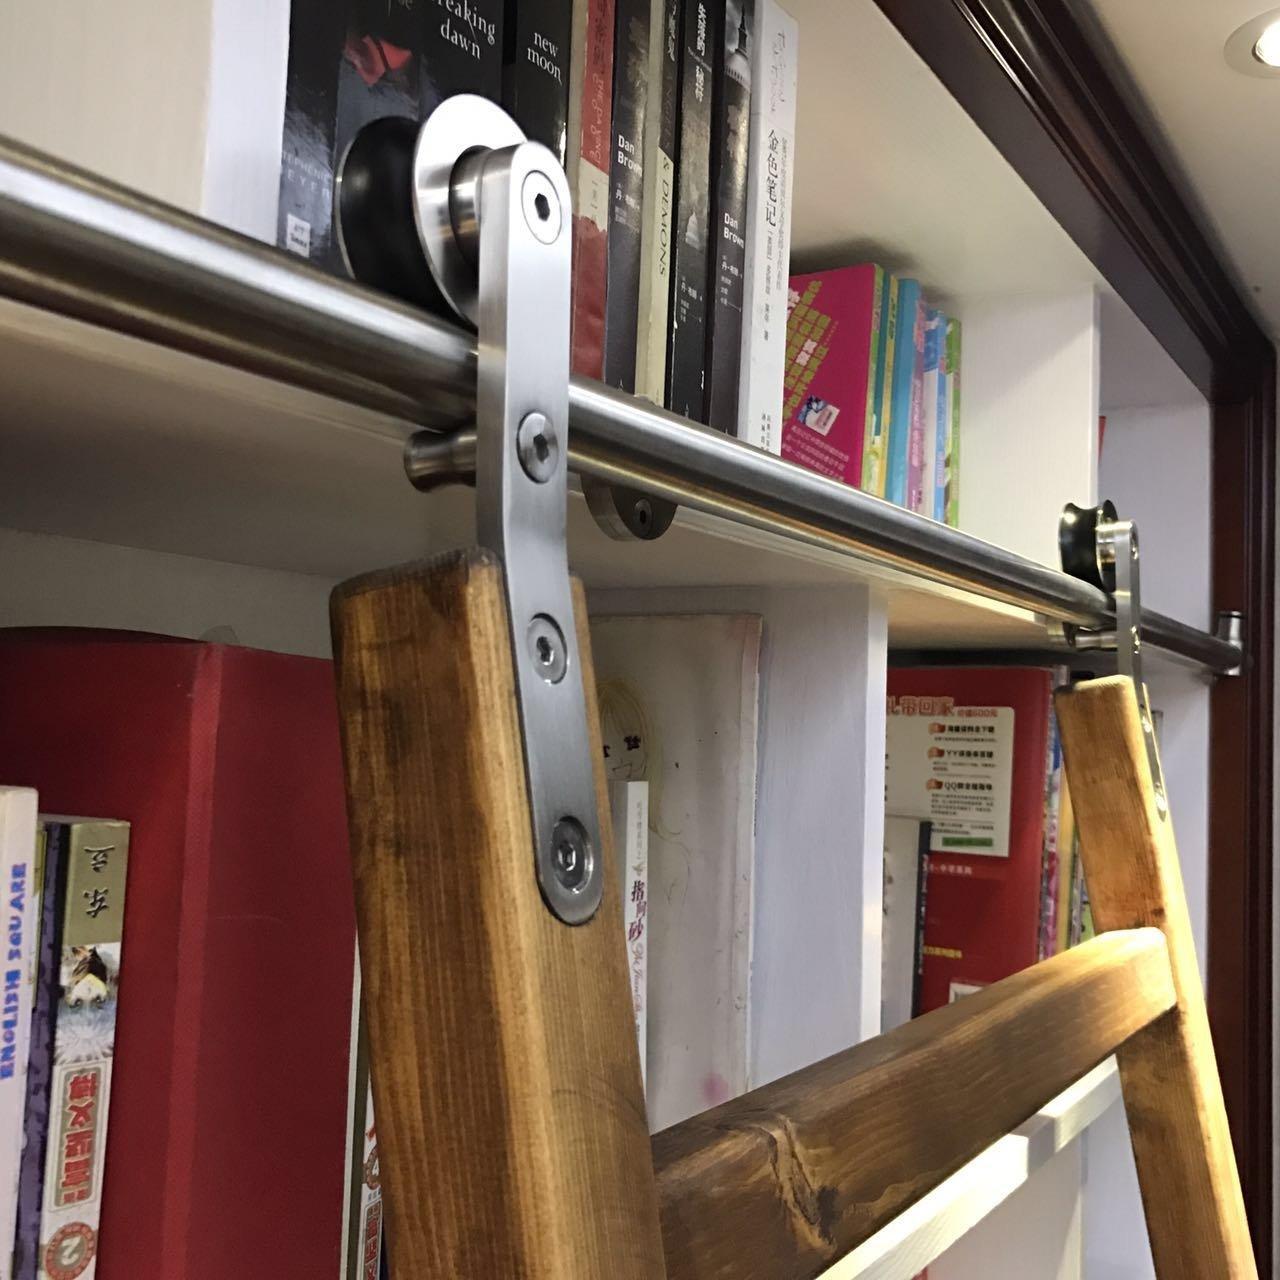 DIYHD 13FT Stainless Steel Sliding Library Ladder Hardware(No Ladder)